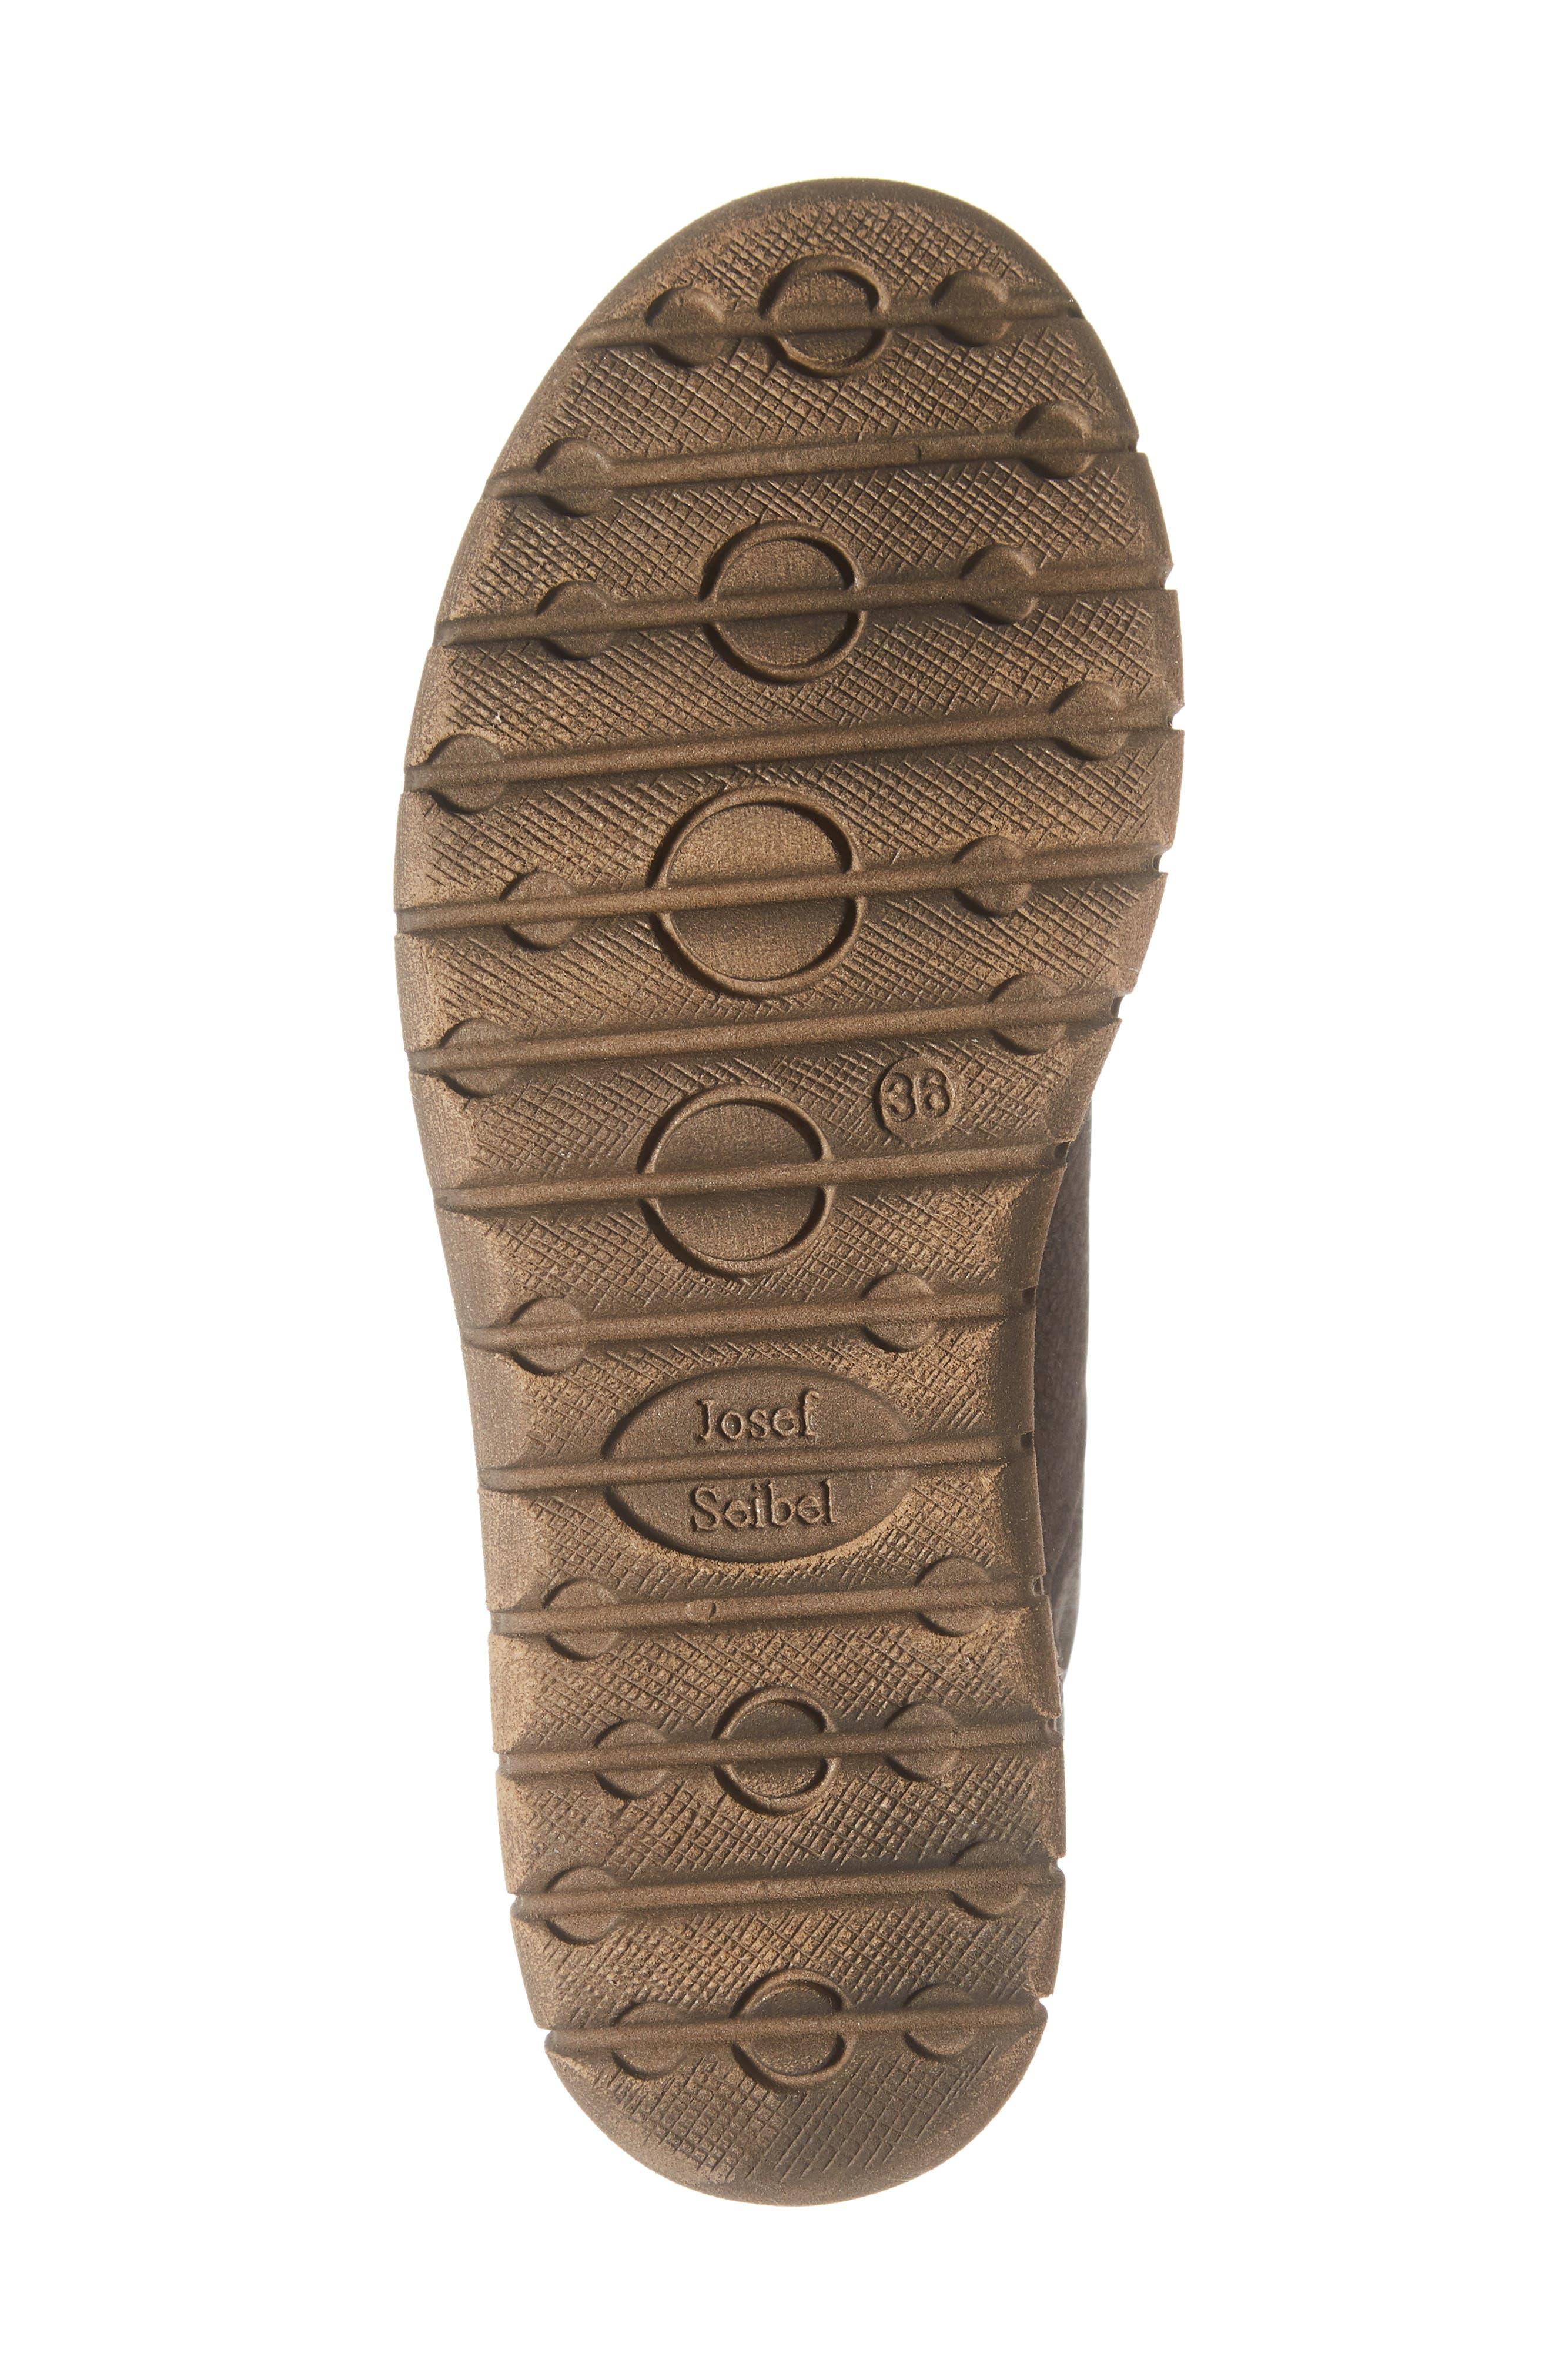 Steffi 58 Sneaker Bootie,                             Alternate thumbnail 6, color,                             TITAN LEATHER